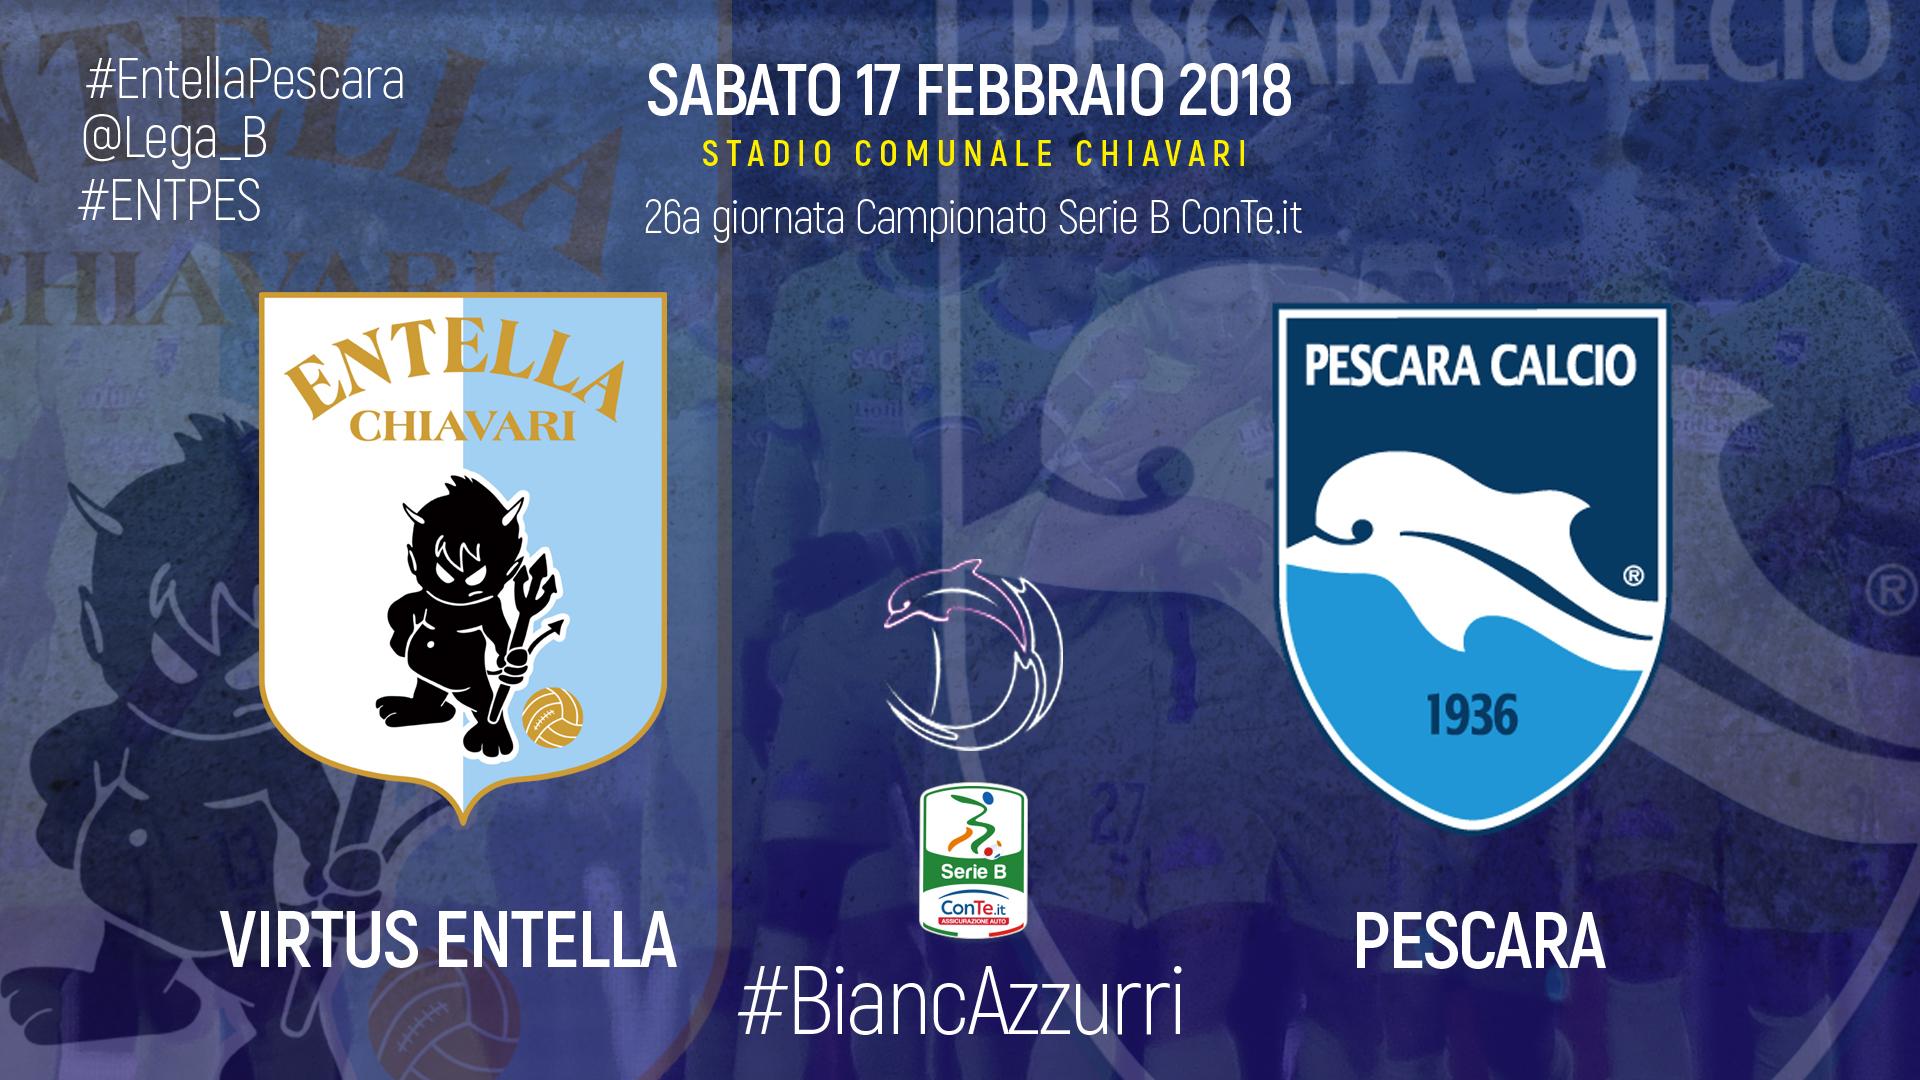 INFO BIGLIETTI #EntellaPescara #ENTPES @Lega_B  PESCARA Calcio 1936